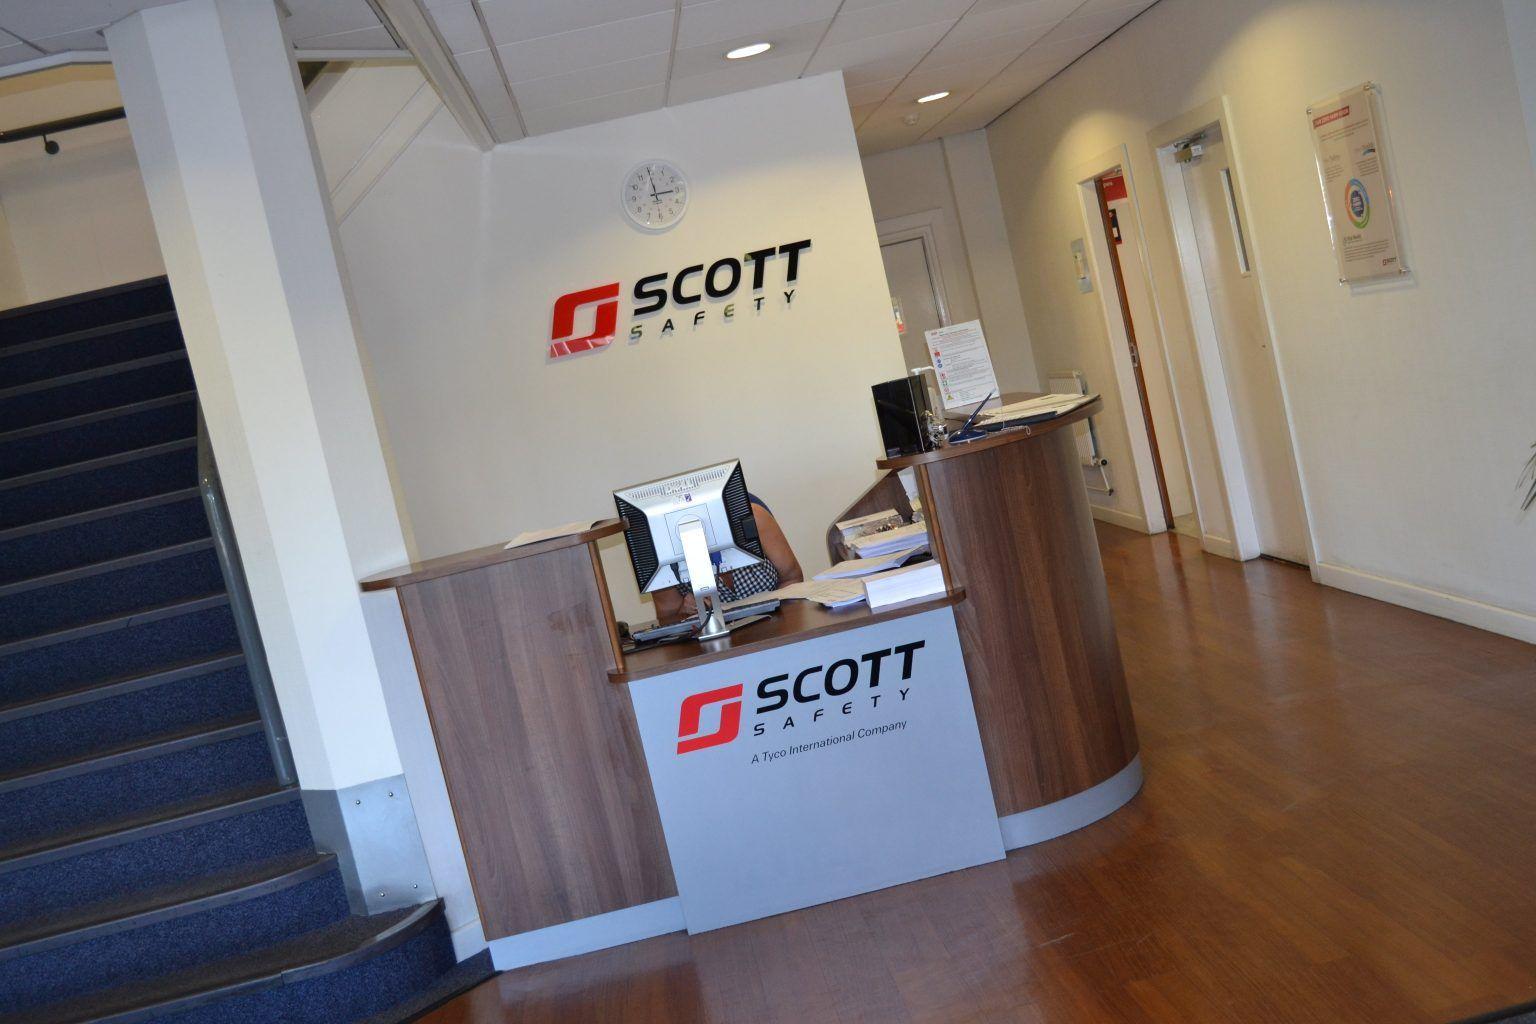 Scott Safety reception signage